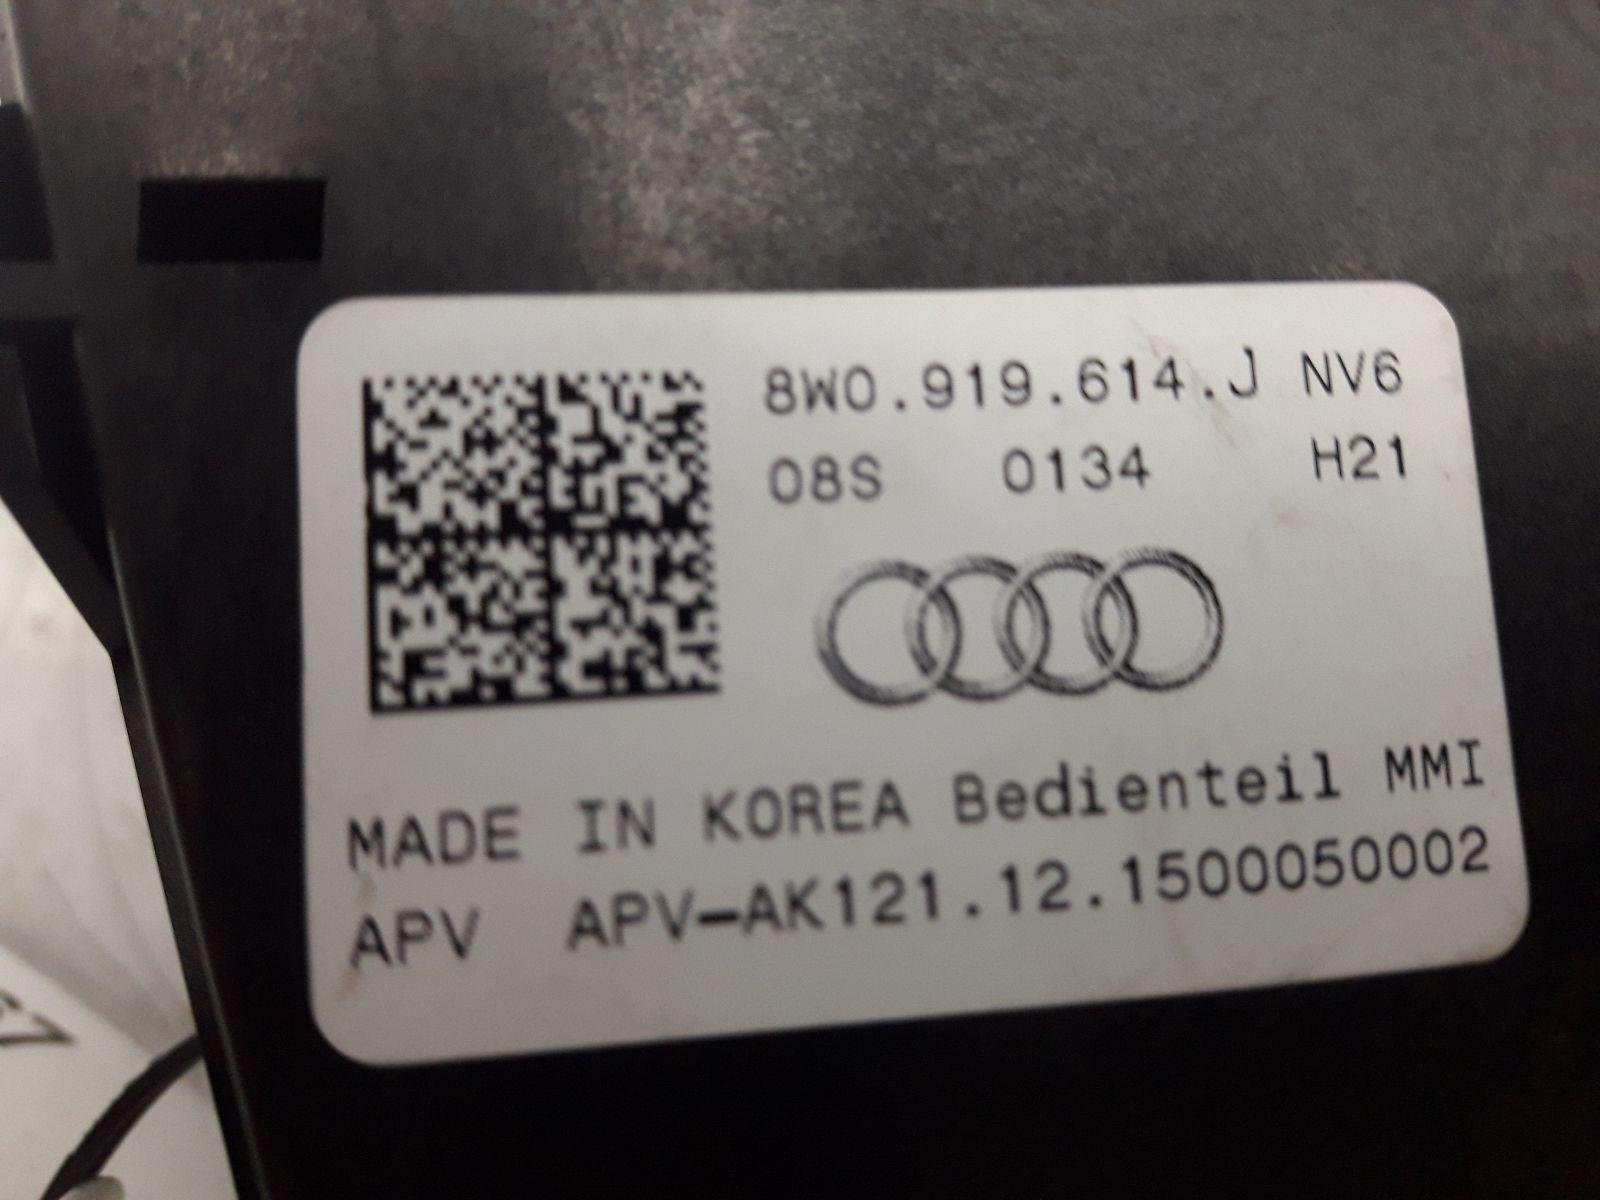 Audi 8W0 919 614 J    MMI CONTROL ROTORY CONTROLS